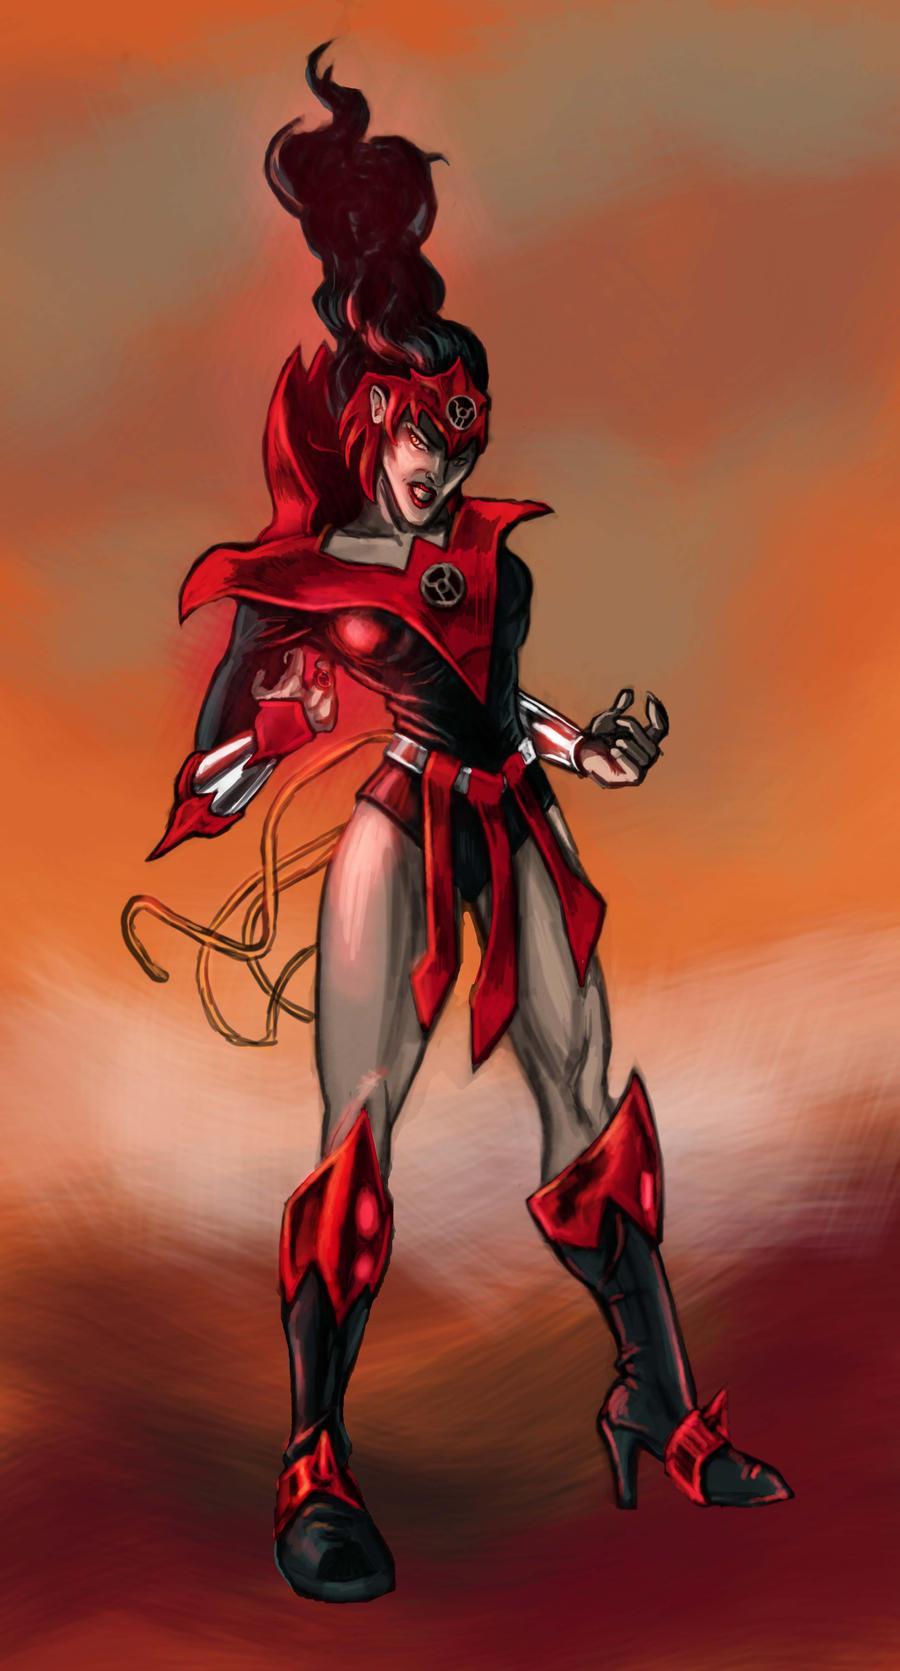 Wonder Woman: Red Lantern by timothylaskey